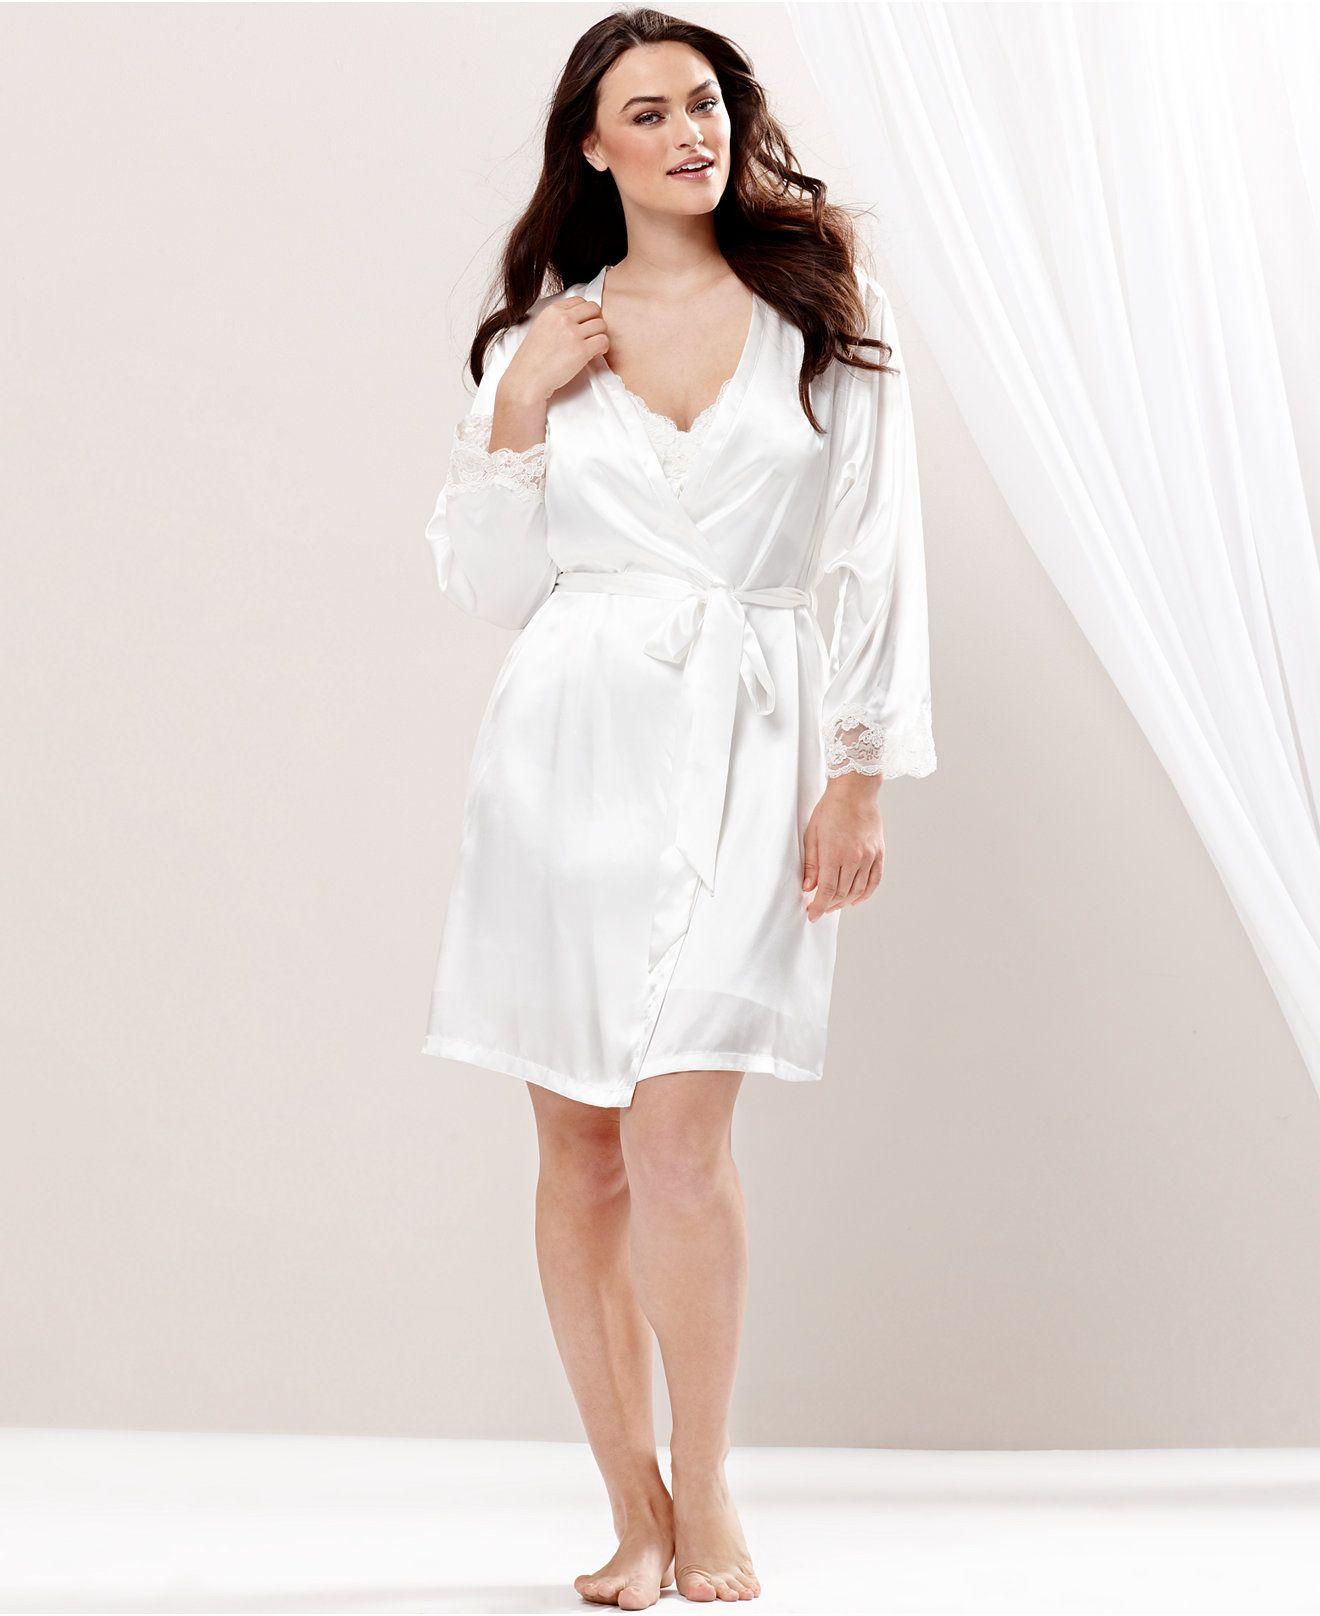 e40237968ae90 Jones New York Plus Size Bridal Wrap - Lingerie - Women - Macy's ...